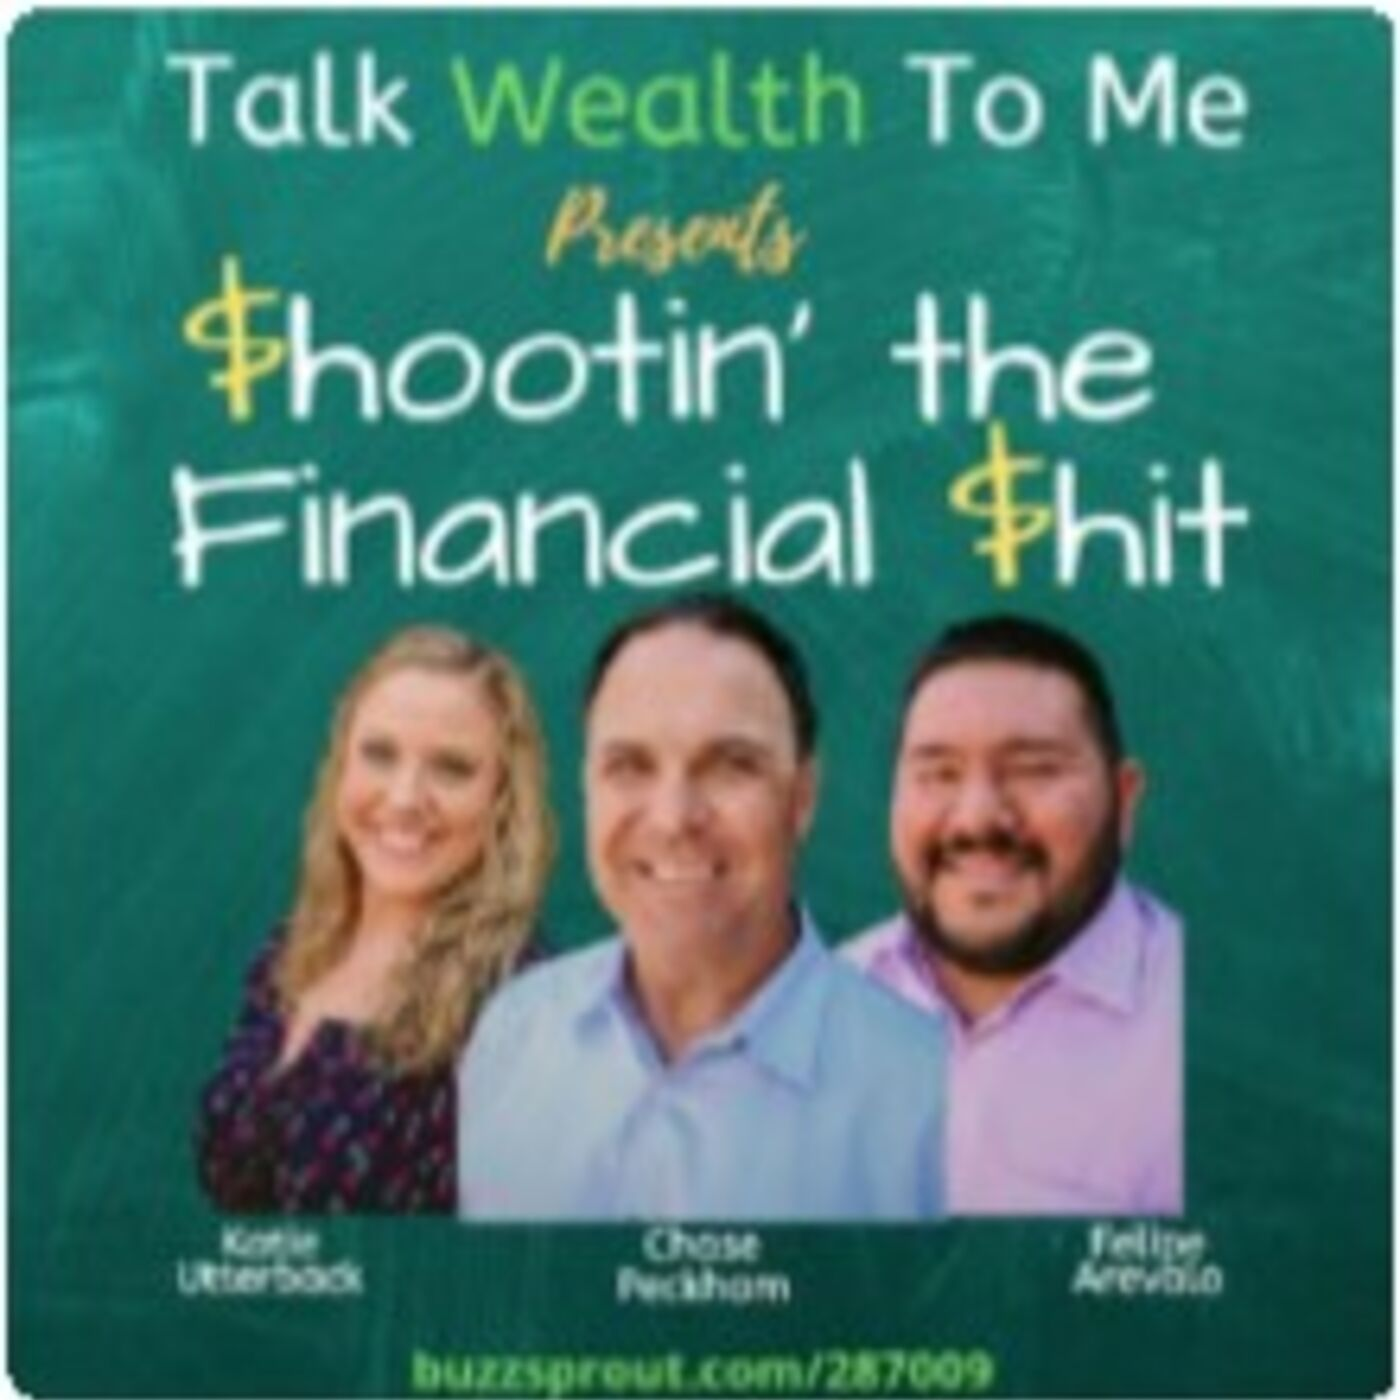 #092 Shootin the Financial Sh!t: Sports and Entertainment, A Money Dump???